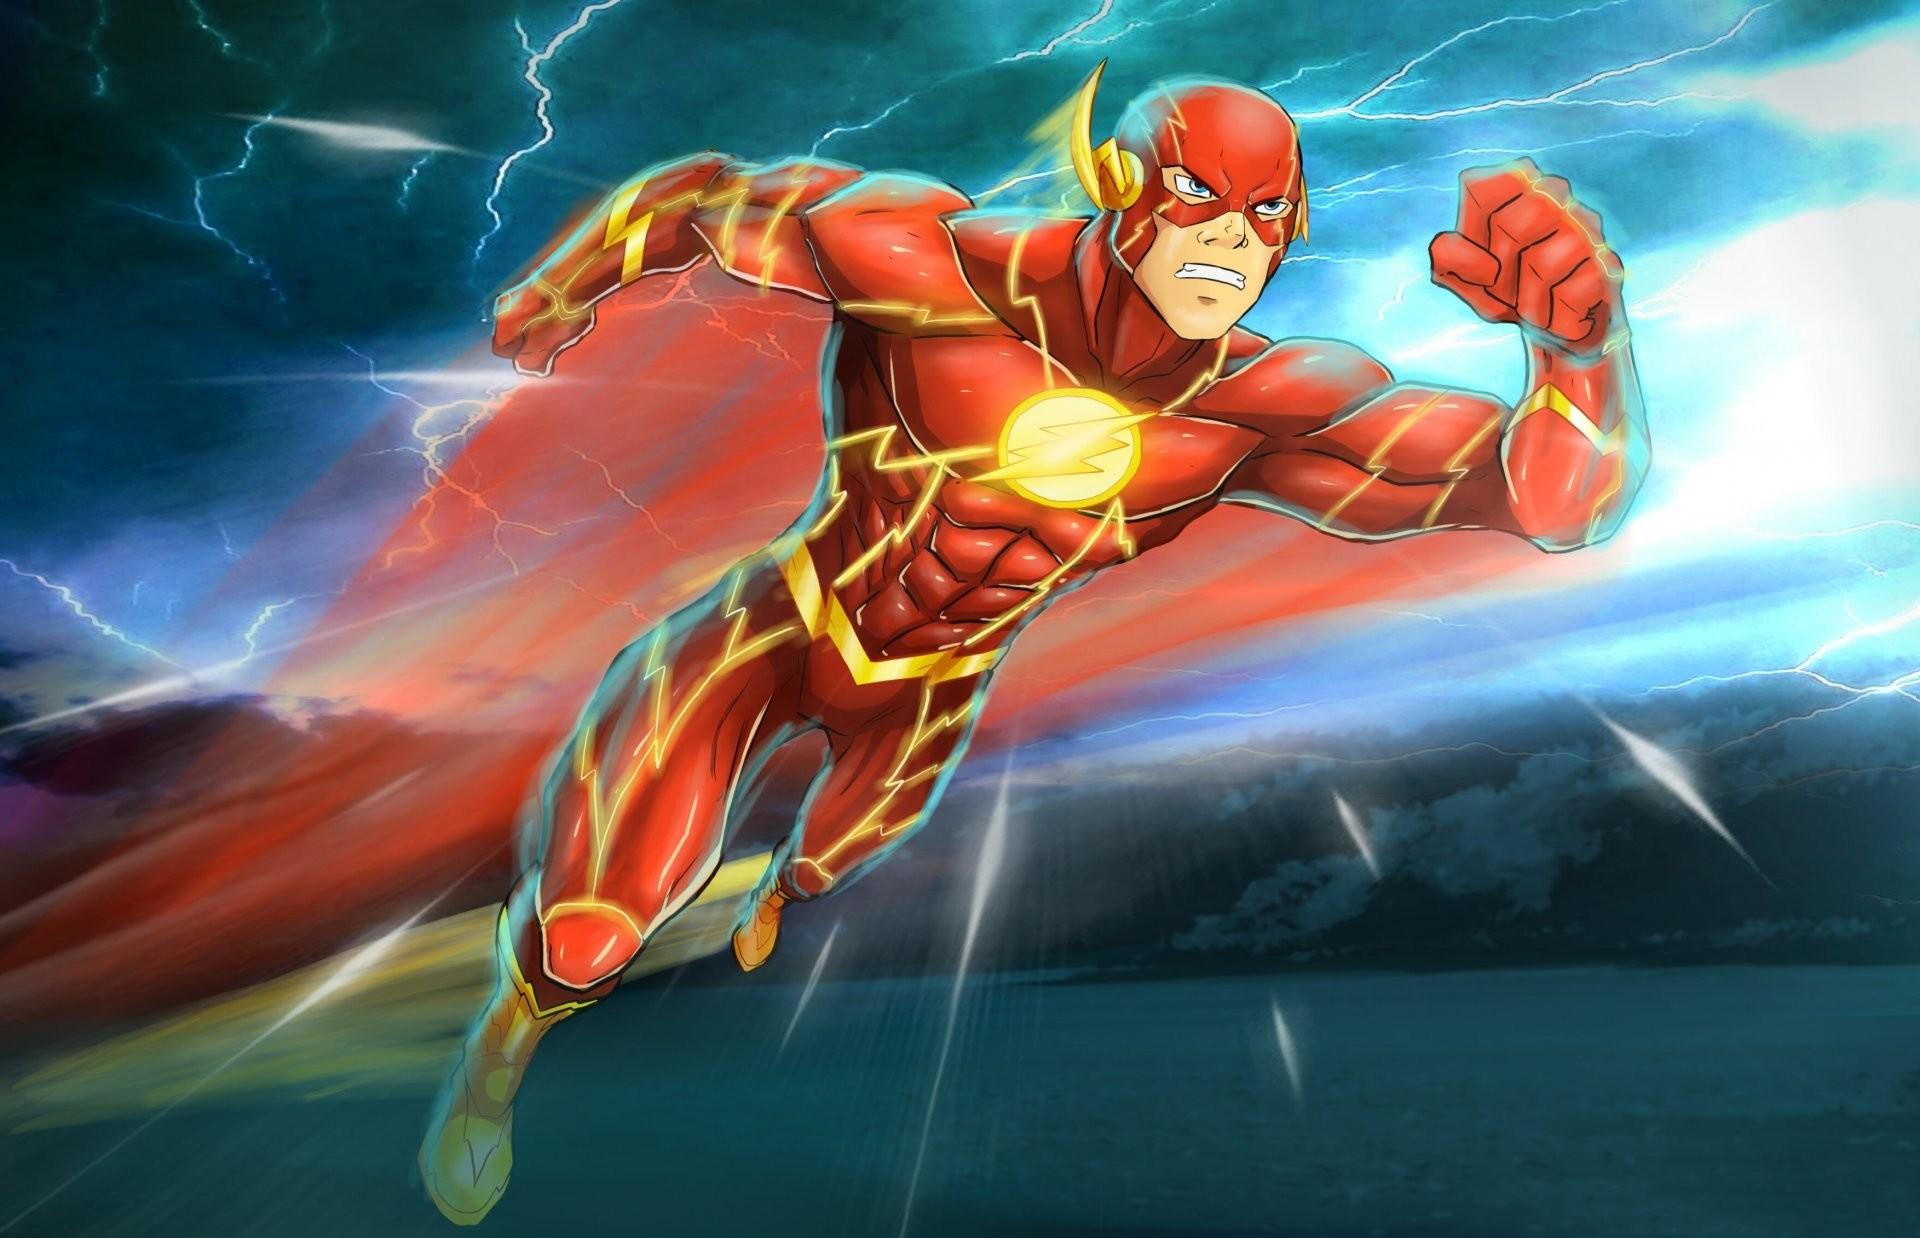 Flash superhero wallpaper 66 images - Super hero flash ...